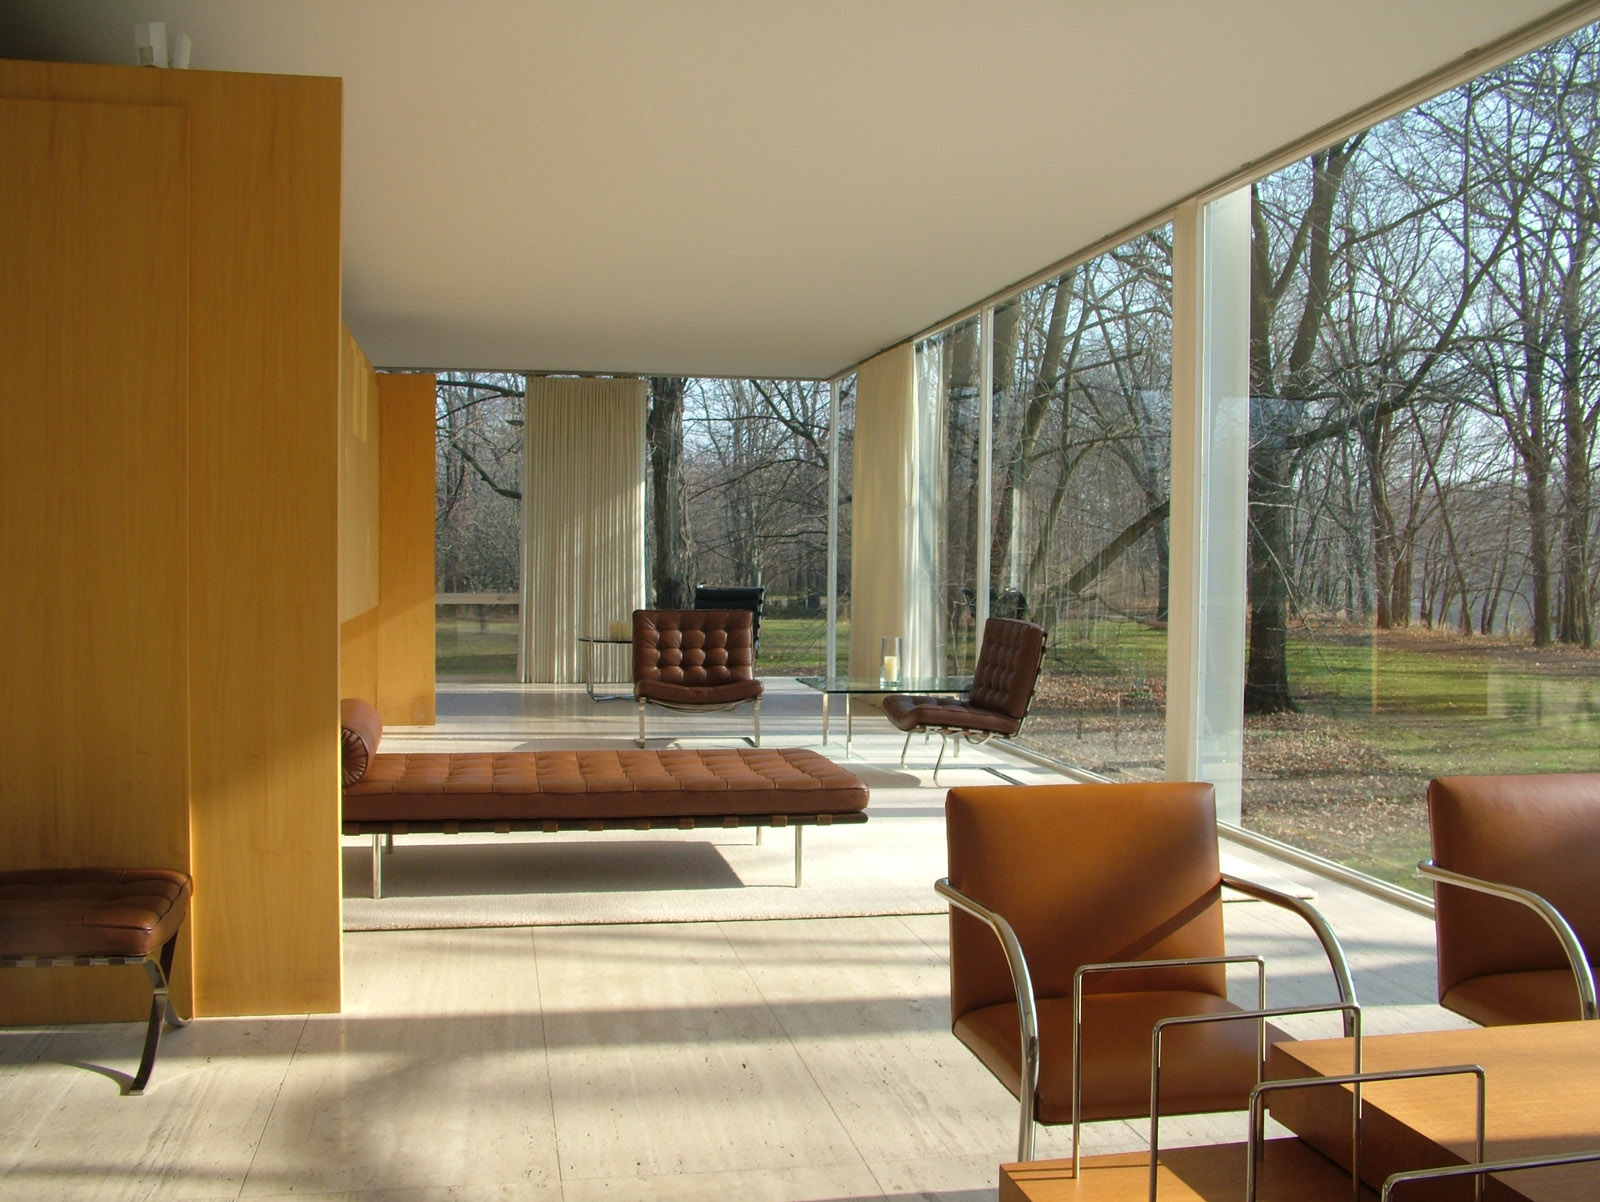 farnsworth house best interior.jpg